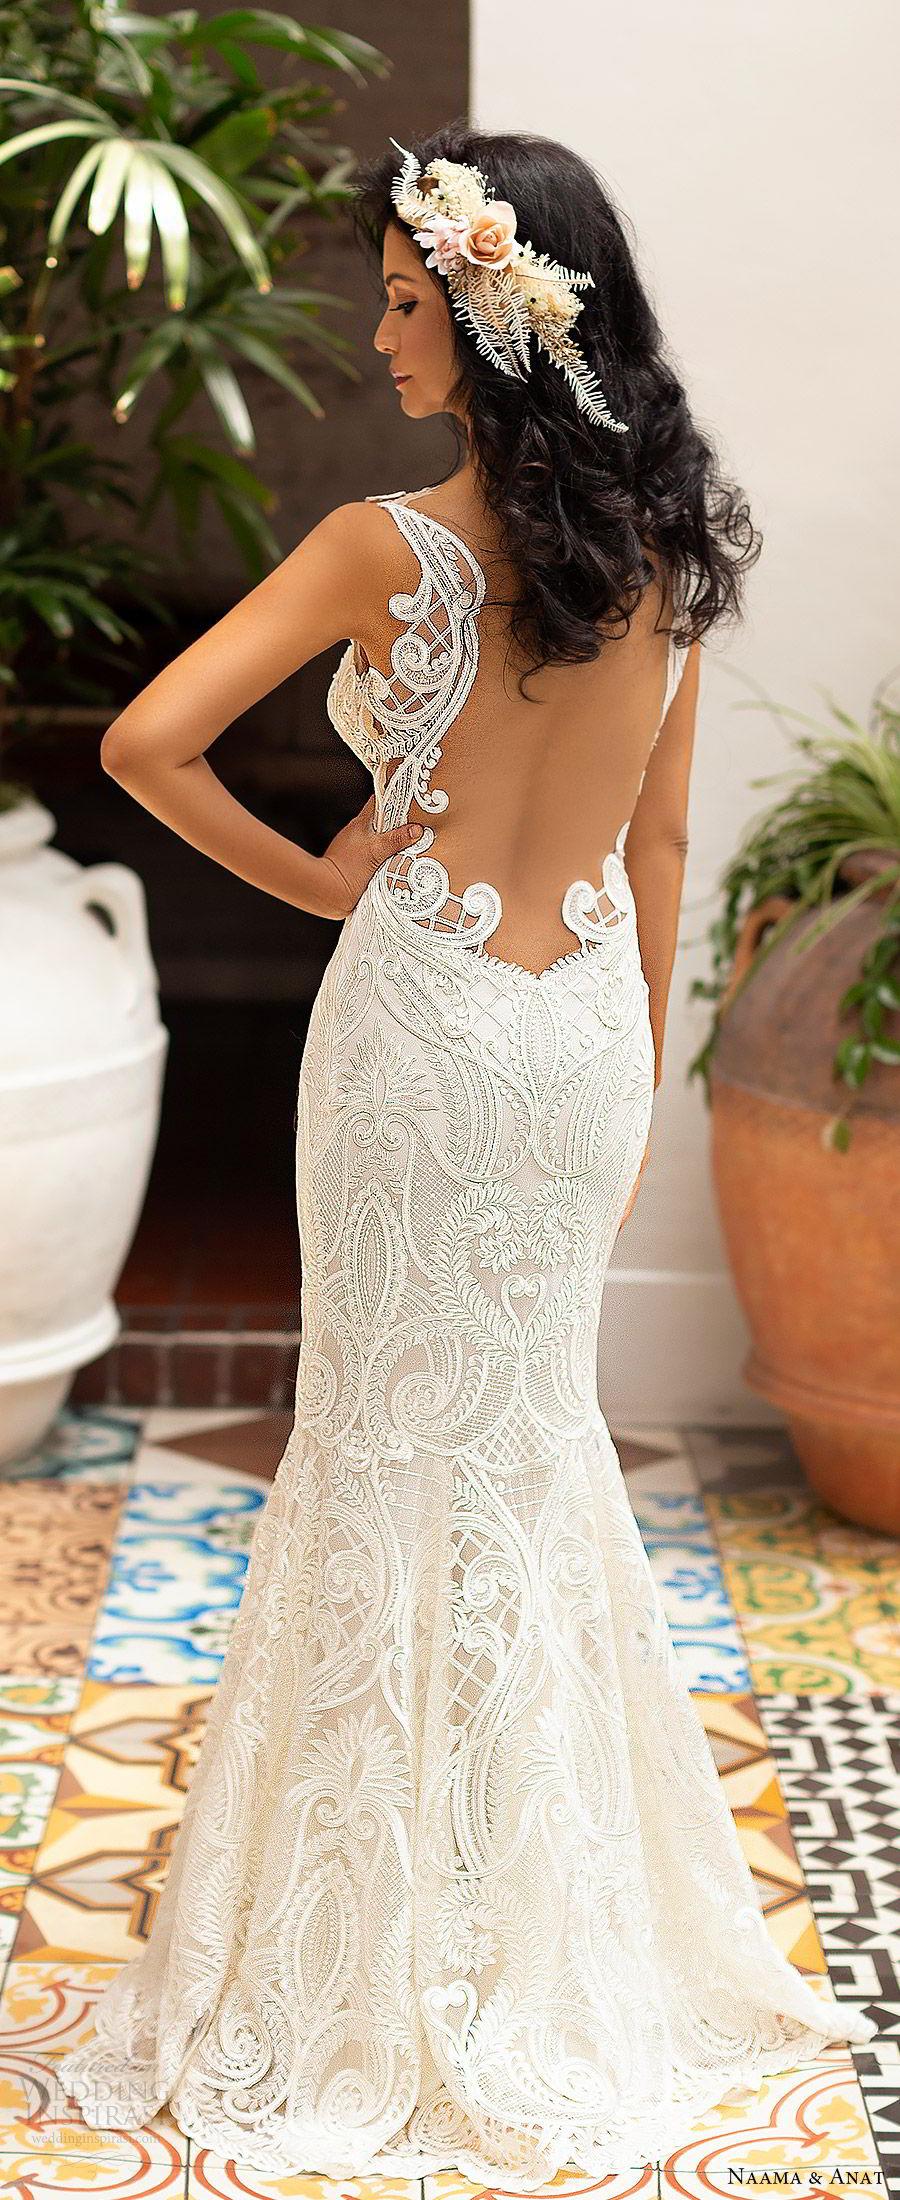 naama anat 2019 bridal sleeveless sweetheart neckline cutout bodice lace fit flare aline wedding dress illusion back sweep train sexy modern (5) zbv